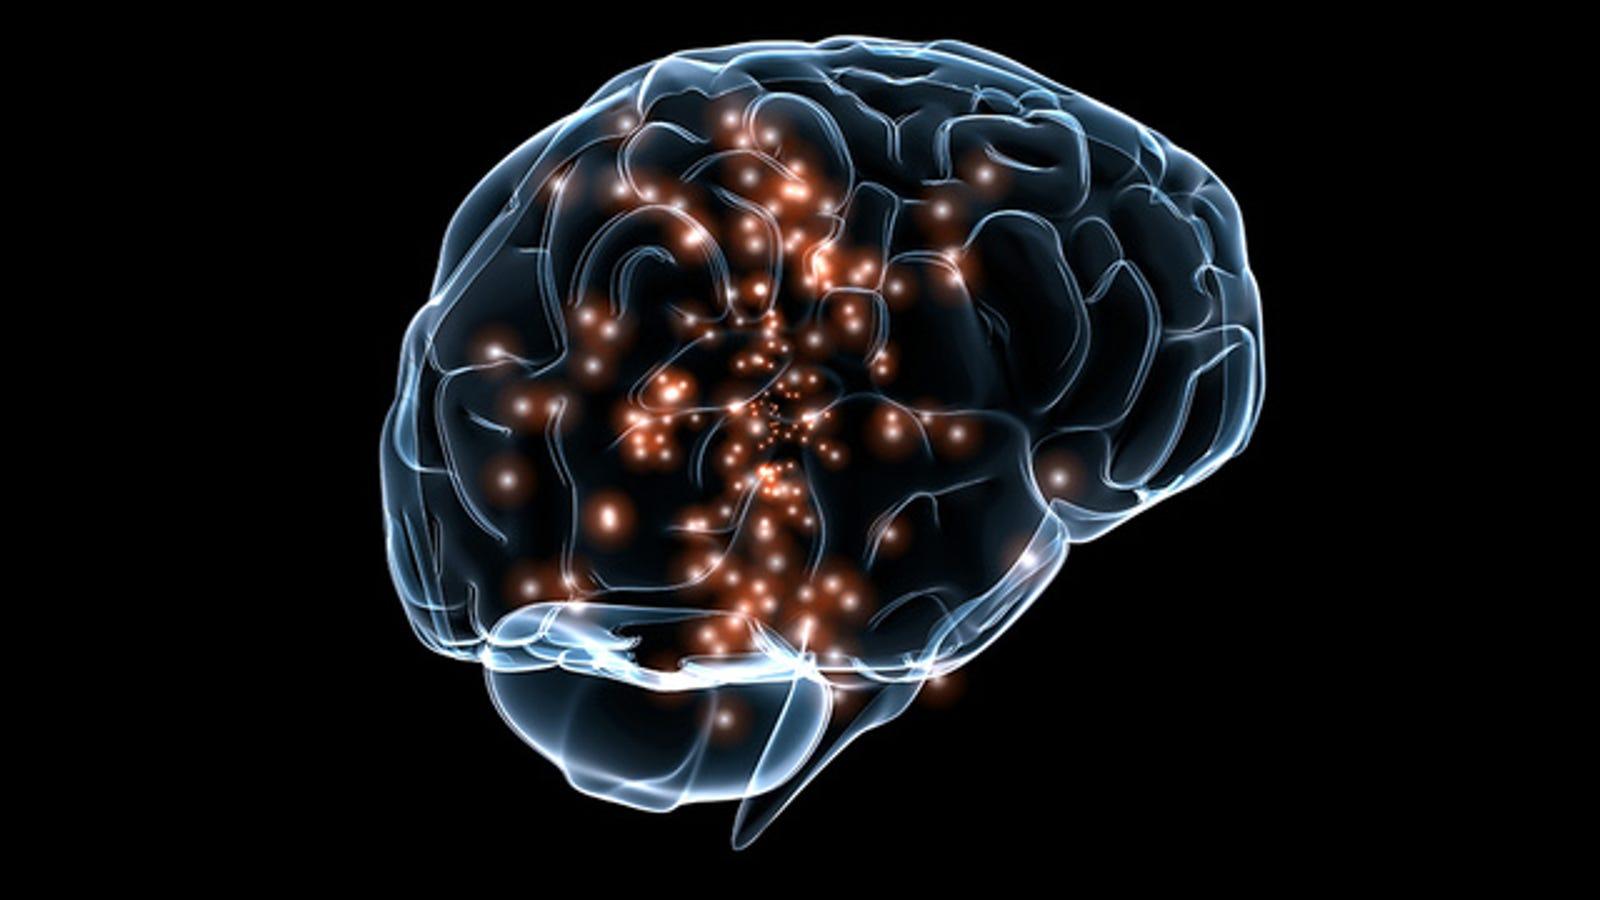 Logran reconstruir la imagen de una cara a partir de ondas cerebrales